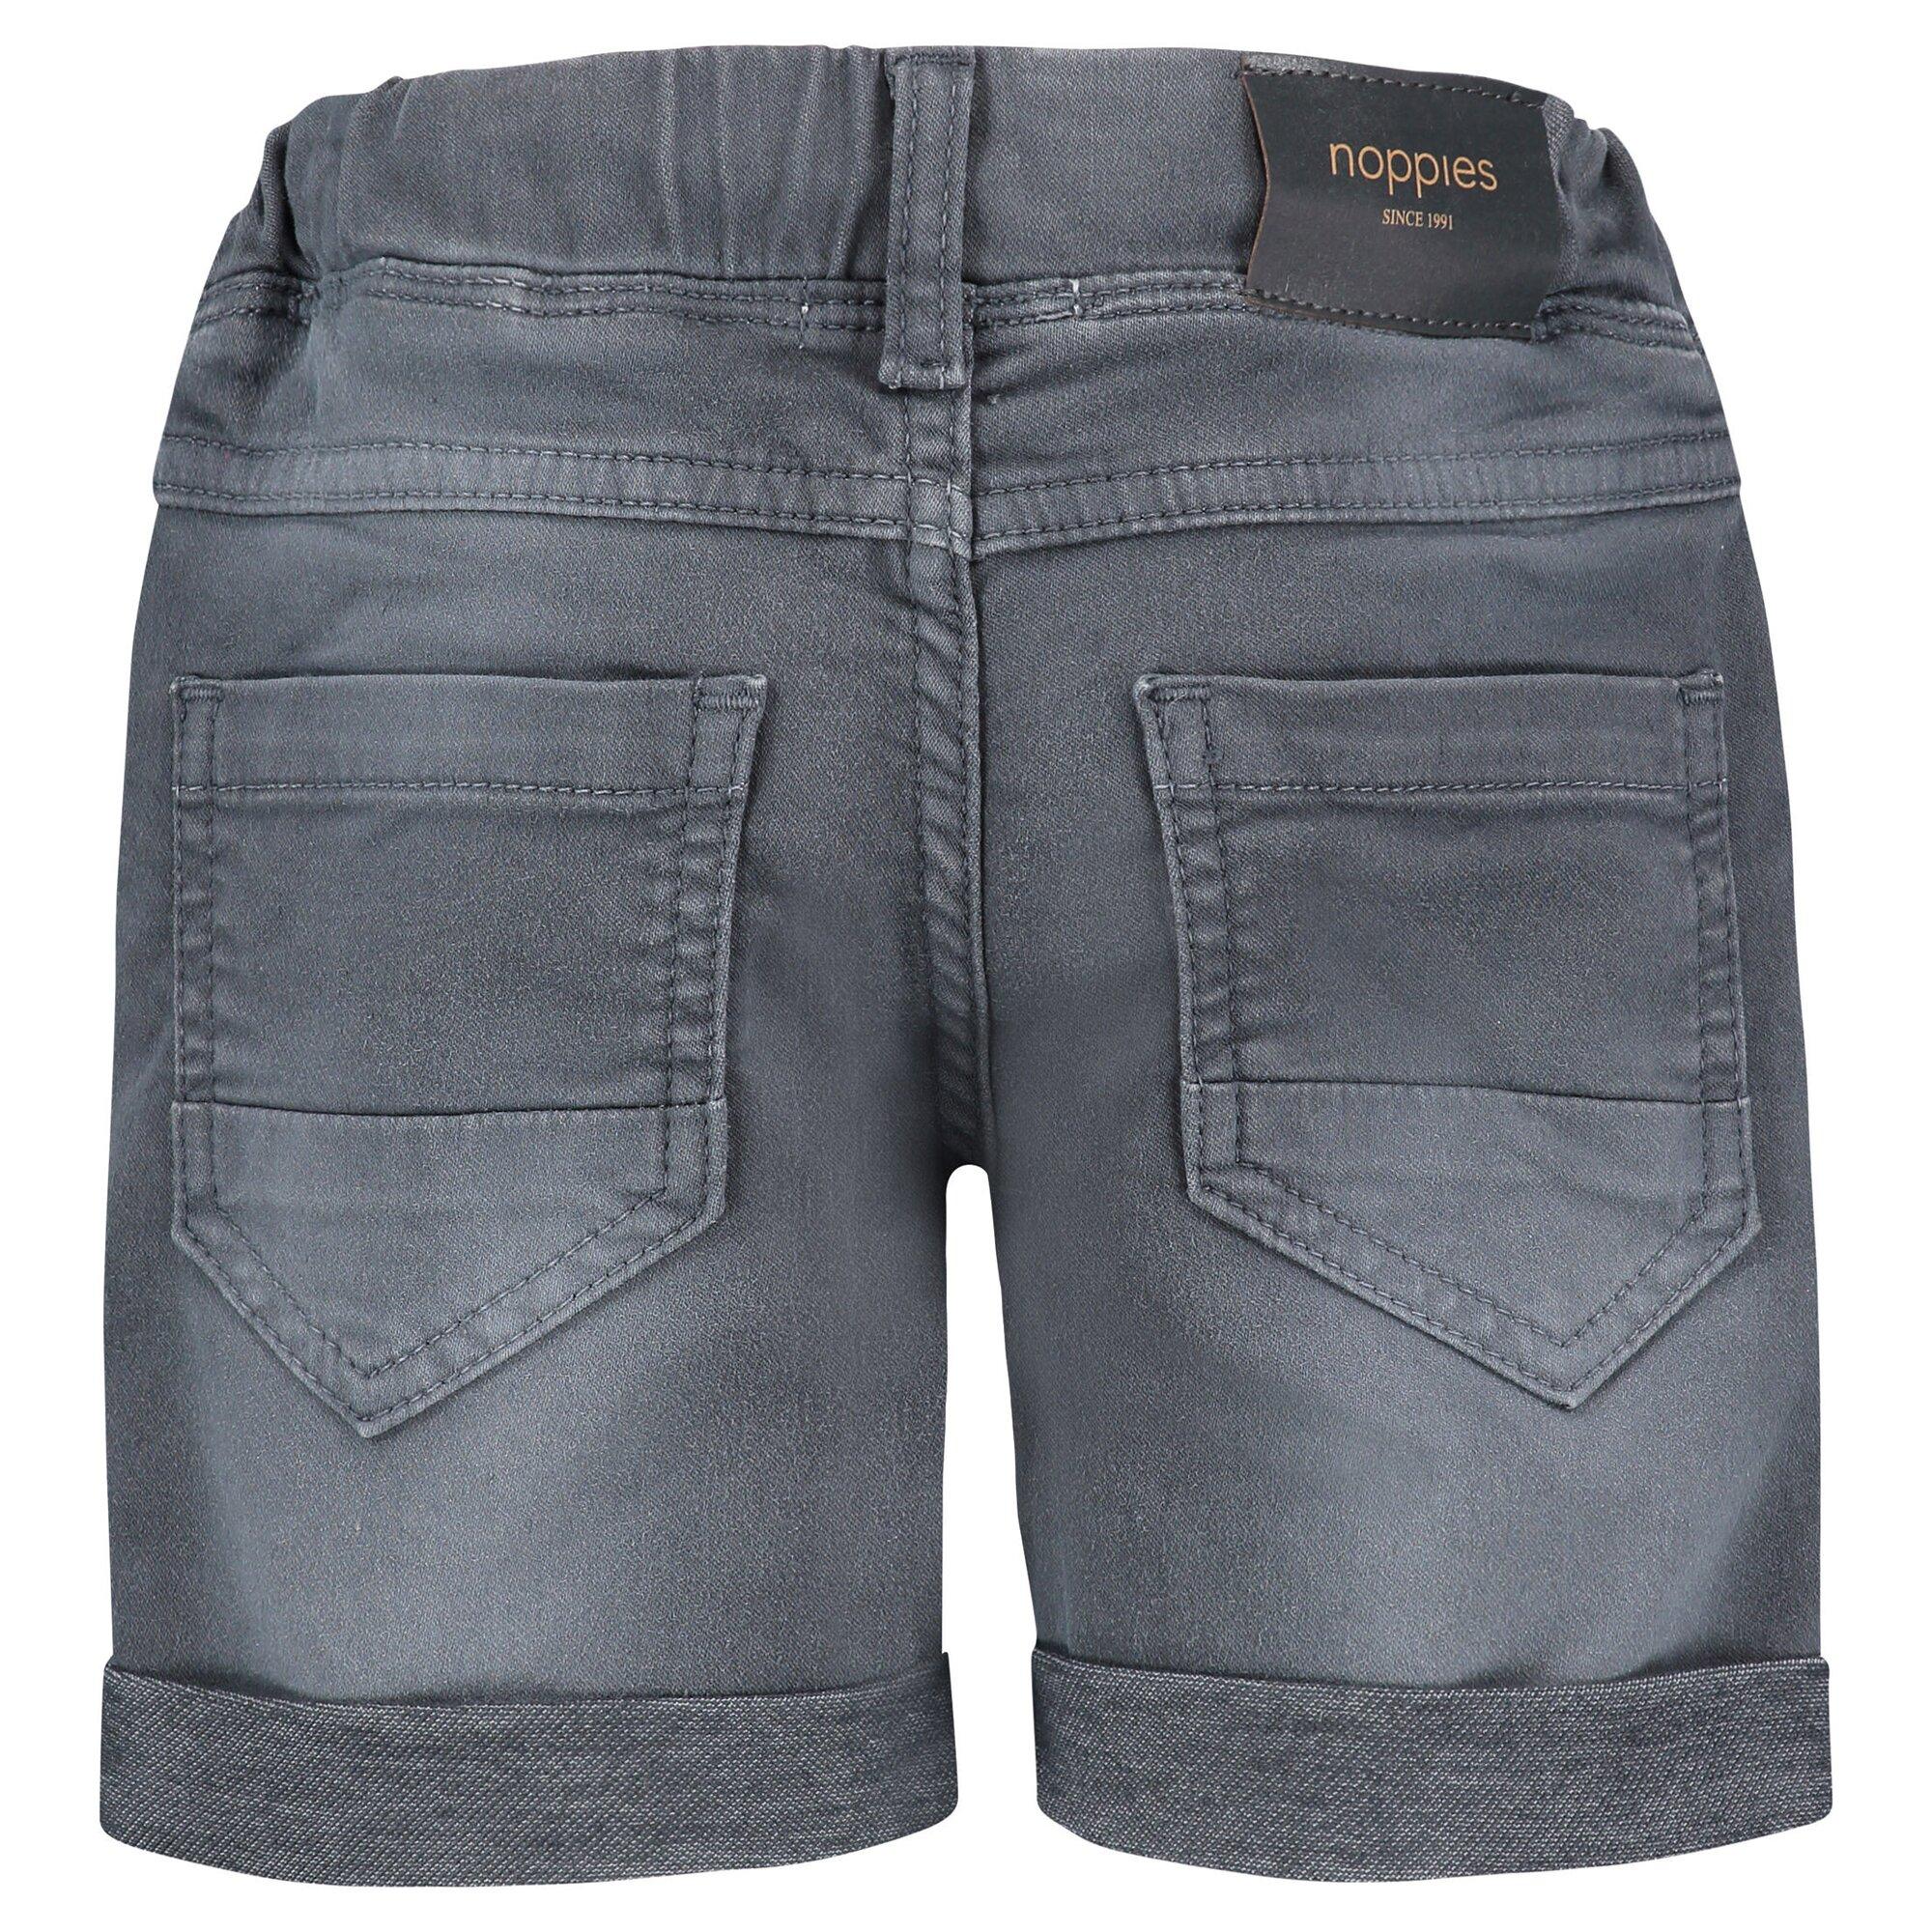 noppies-shorts-snyder